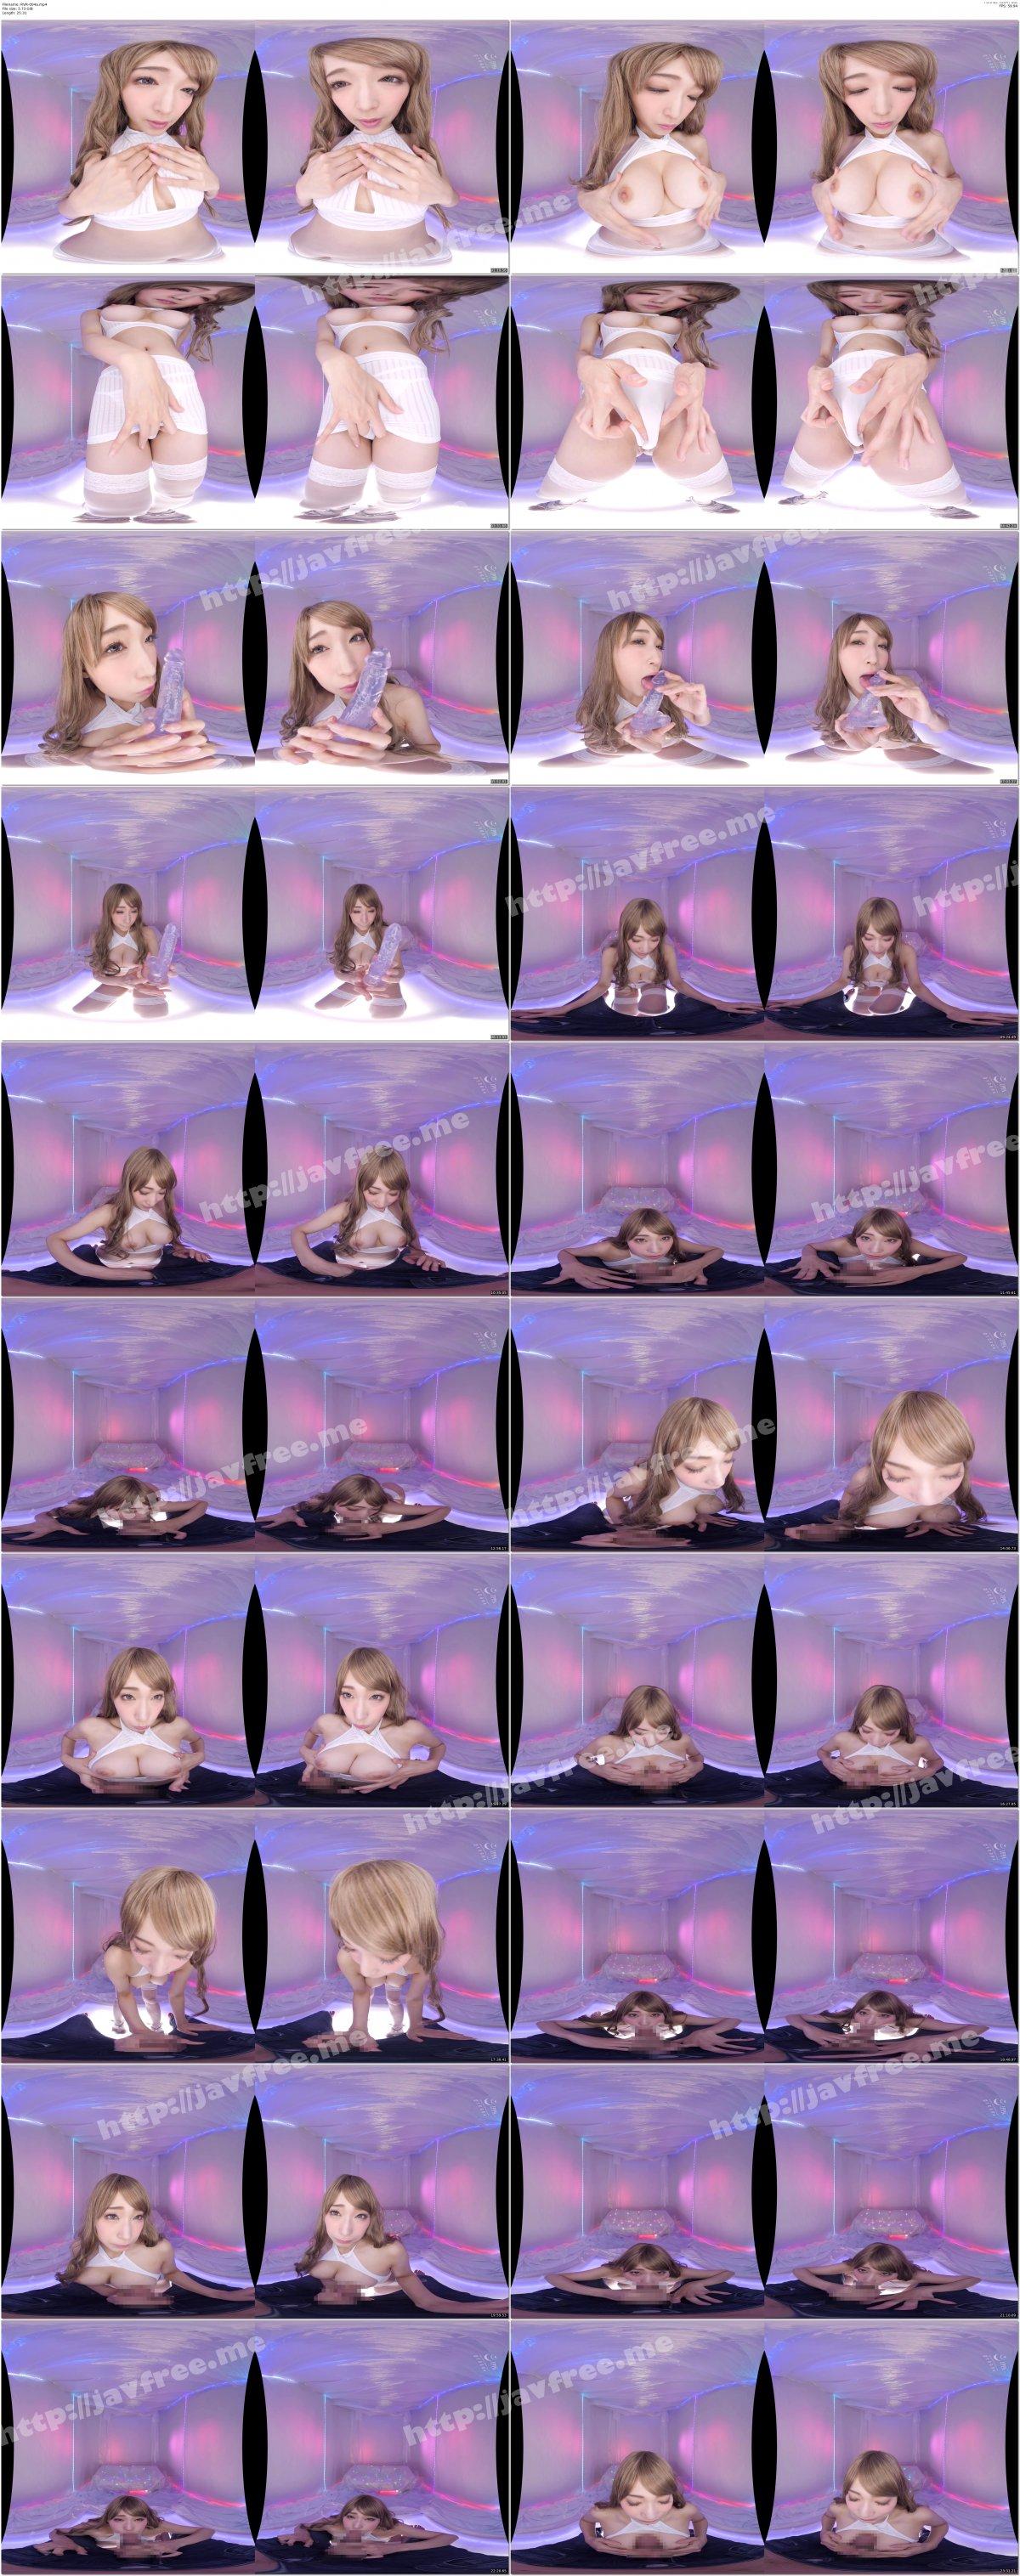 [RVR-004] 【VR】世界で一番エロく見える蓮実クレアの生々しいフェラチオと気持ち良すぎるSEX - image RVR-004a on https://javfree.me